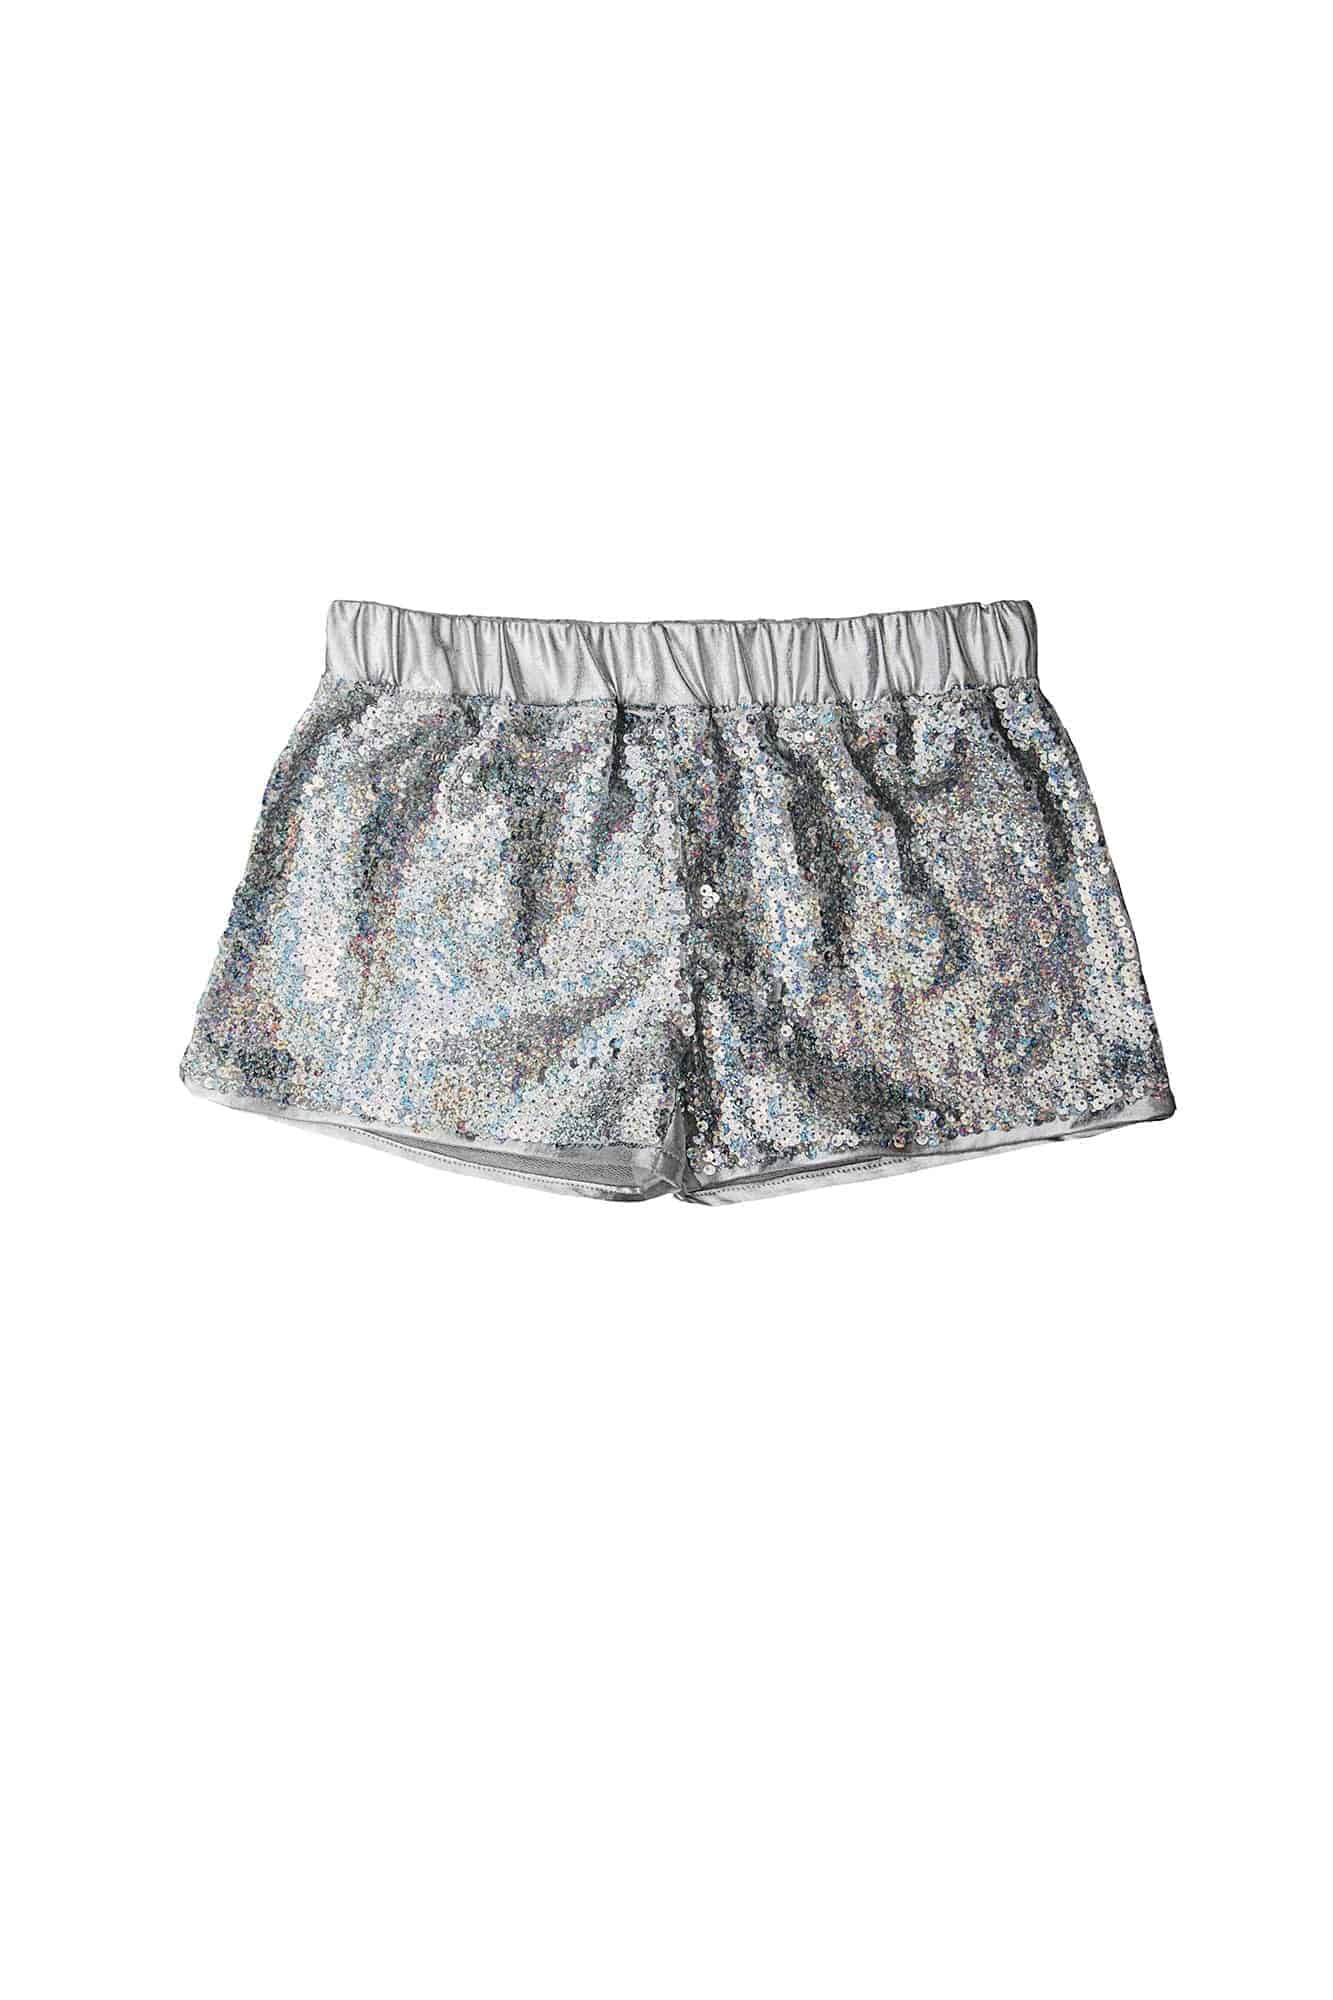 Girls Disco Short Silver